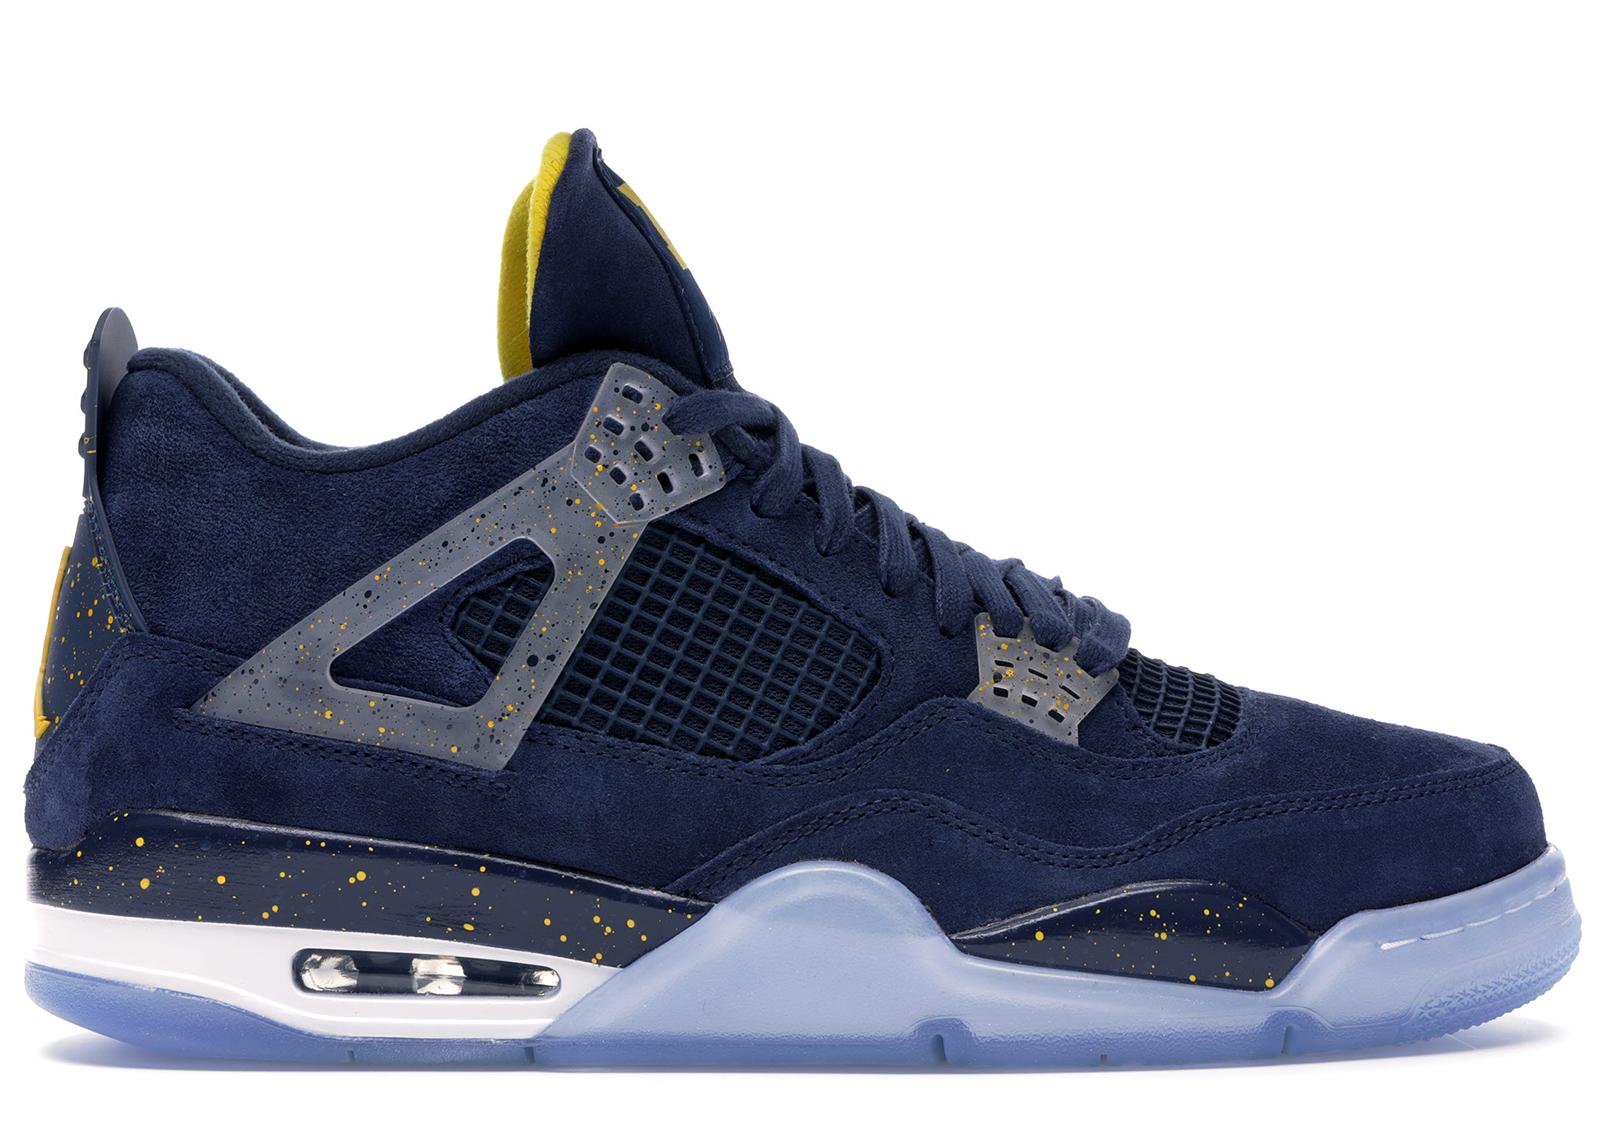 michigan jordan shoes for sale